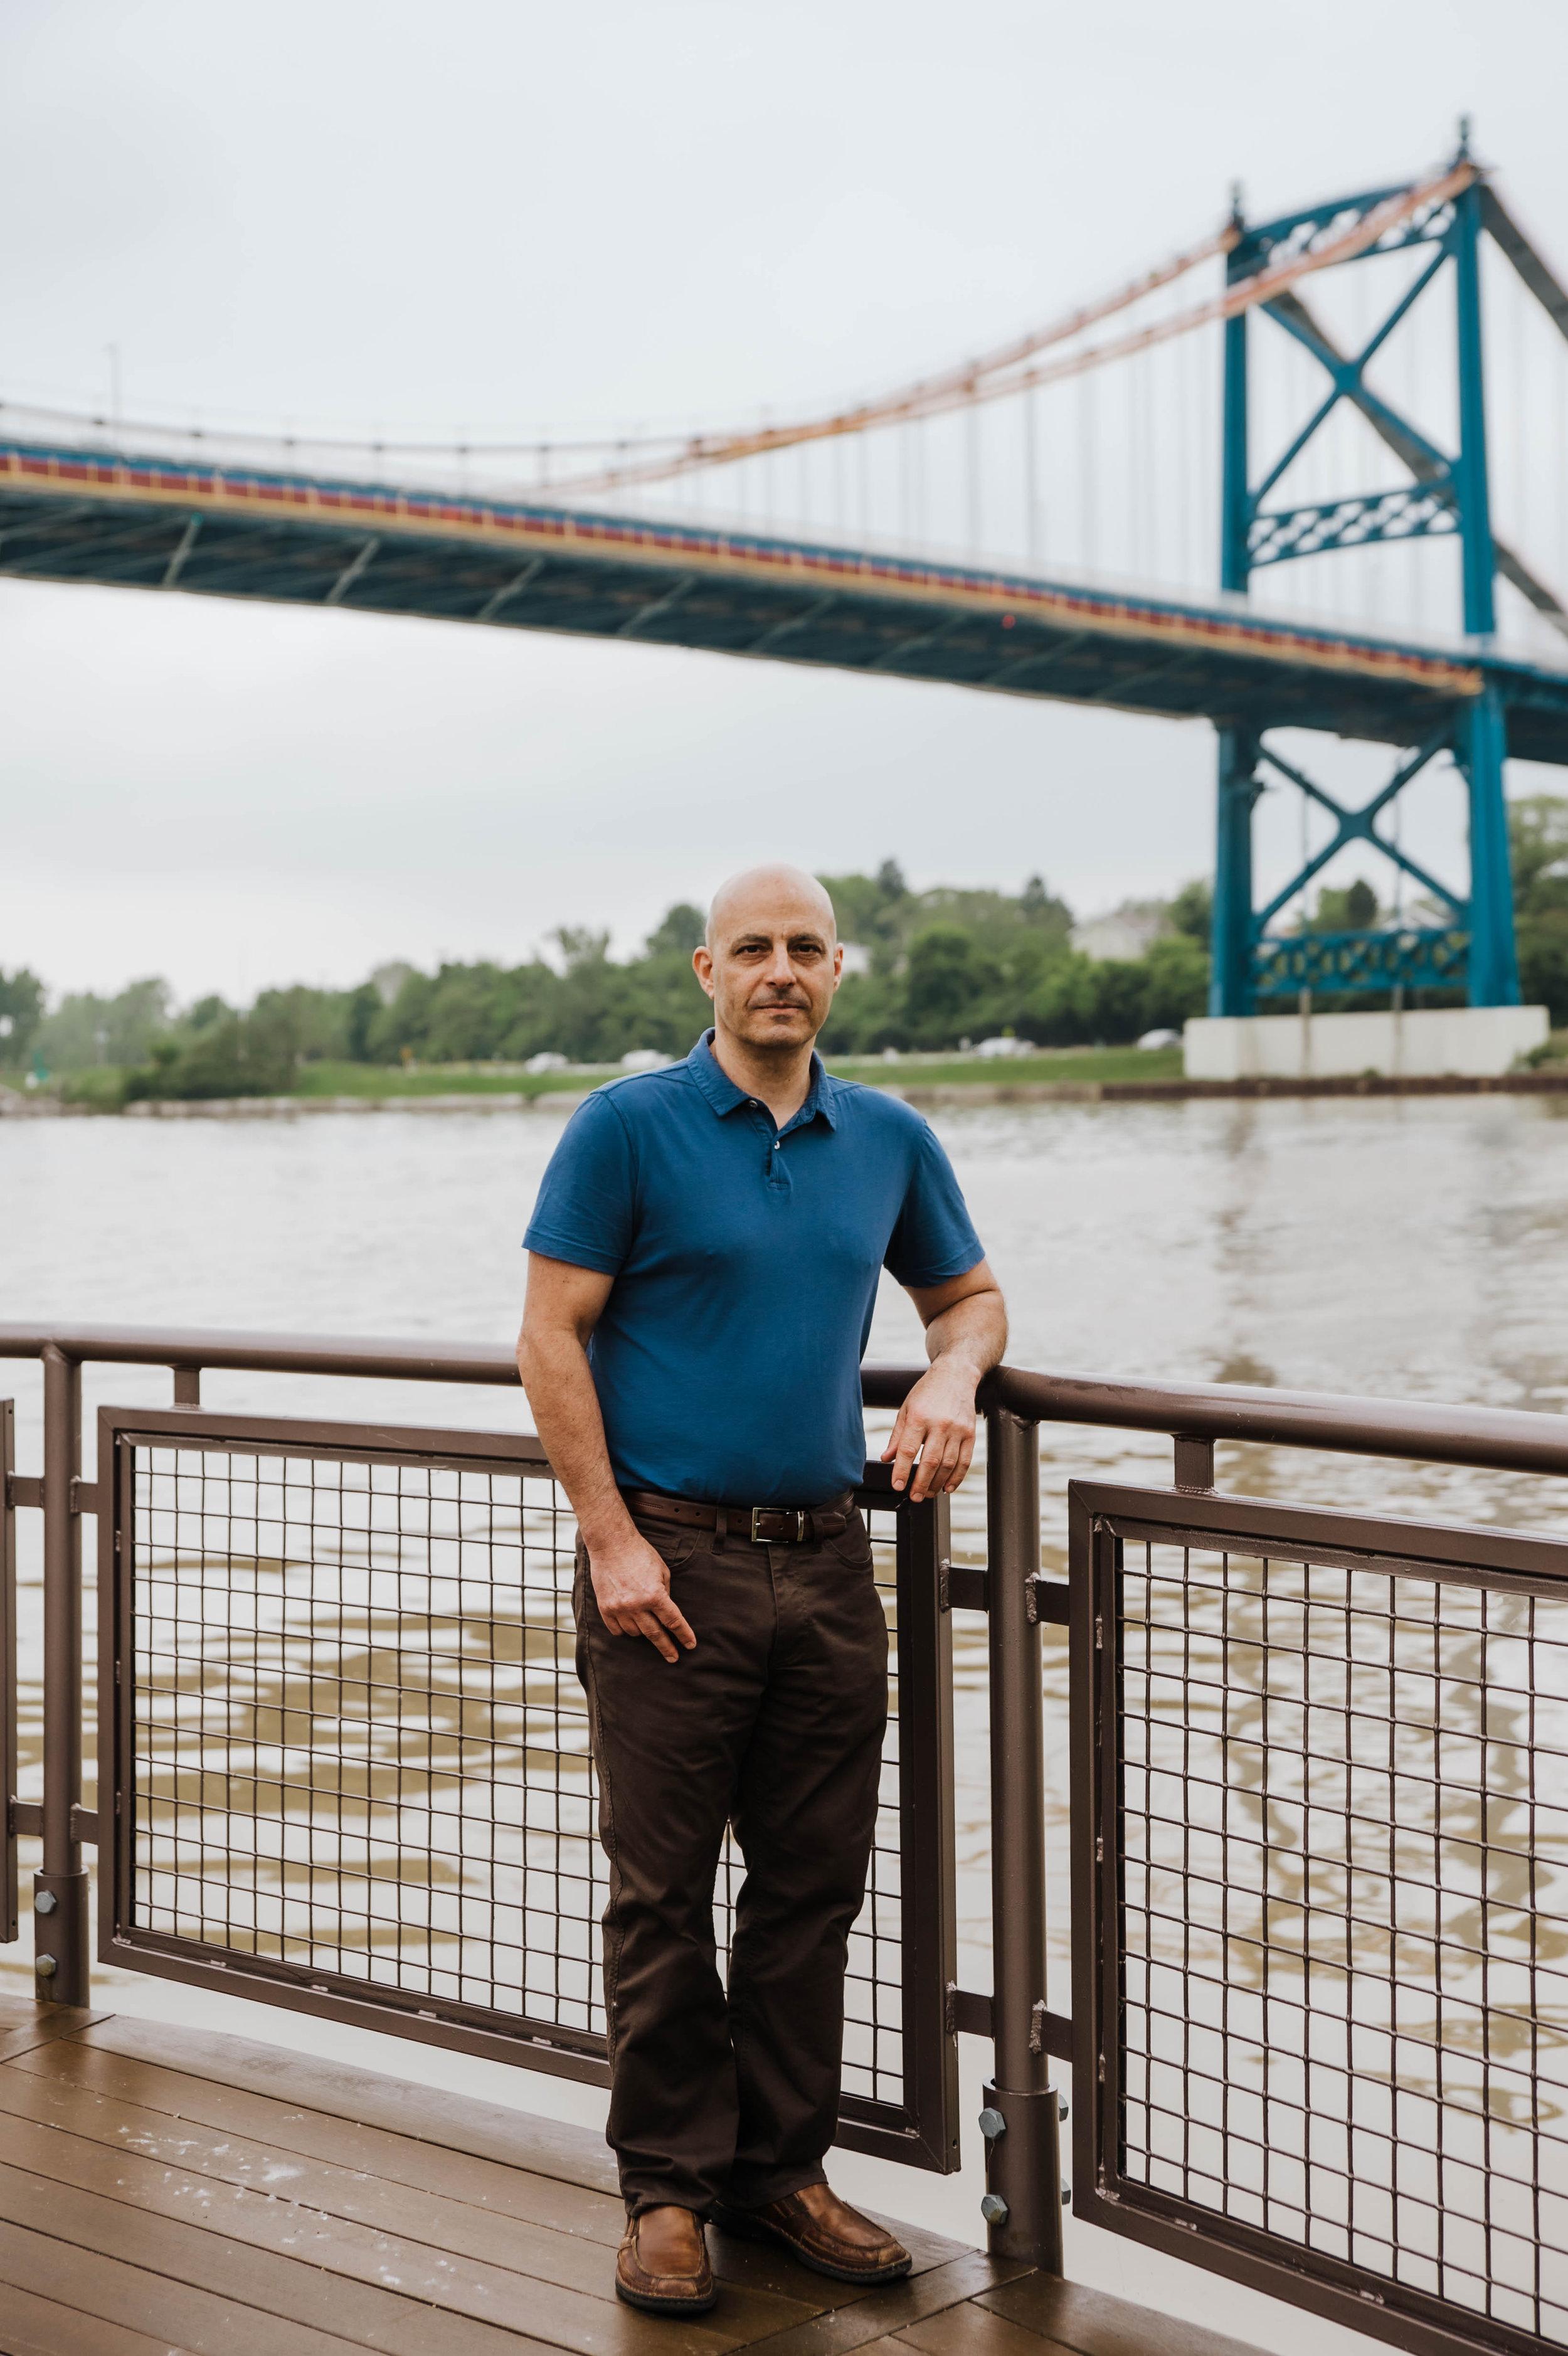 Paul Dymarkowski, Vice Presdient/CFO